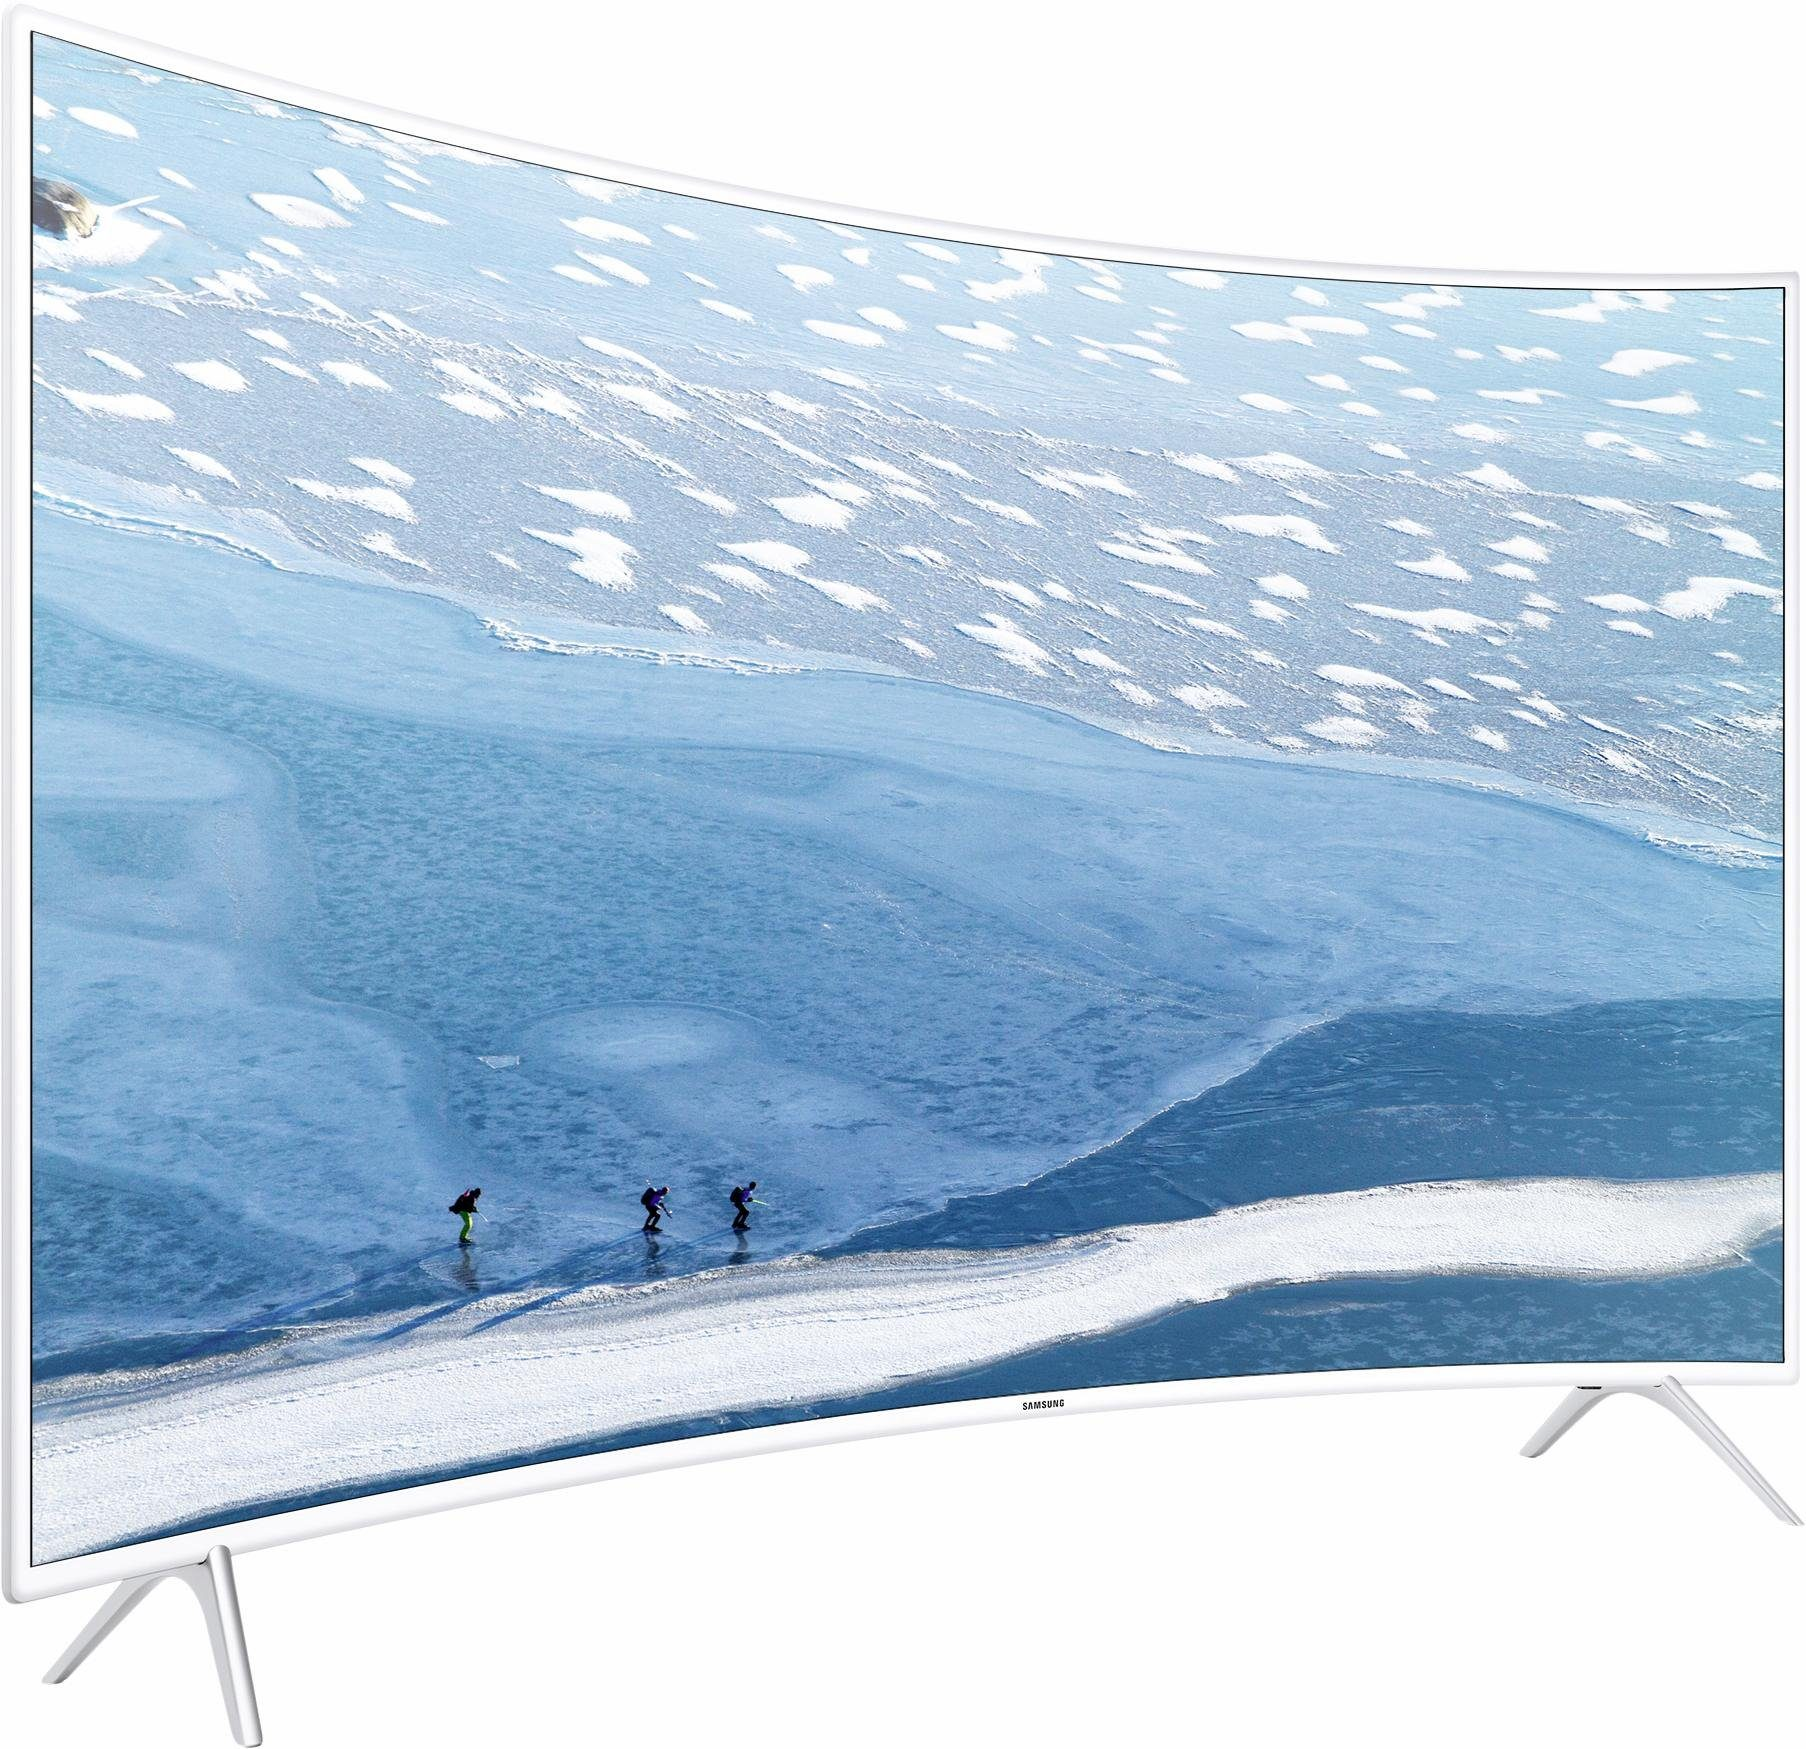 Samsung UE43KU6519UXZG, Curved-LED-Fernseher, 108 cm (43 Zoll), 2160p (4K Ultra HD), Smart-TV